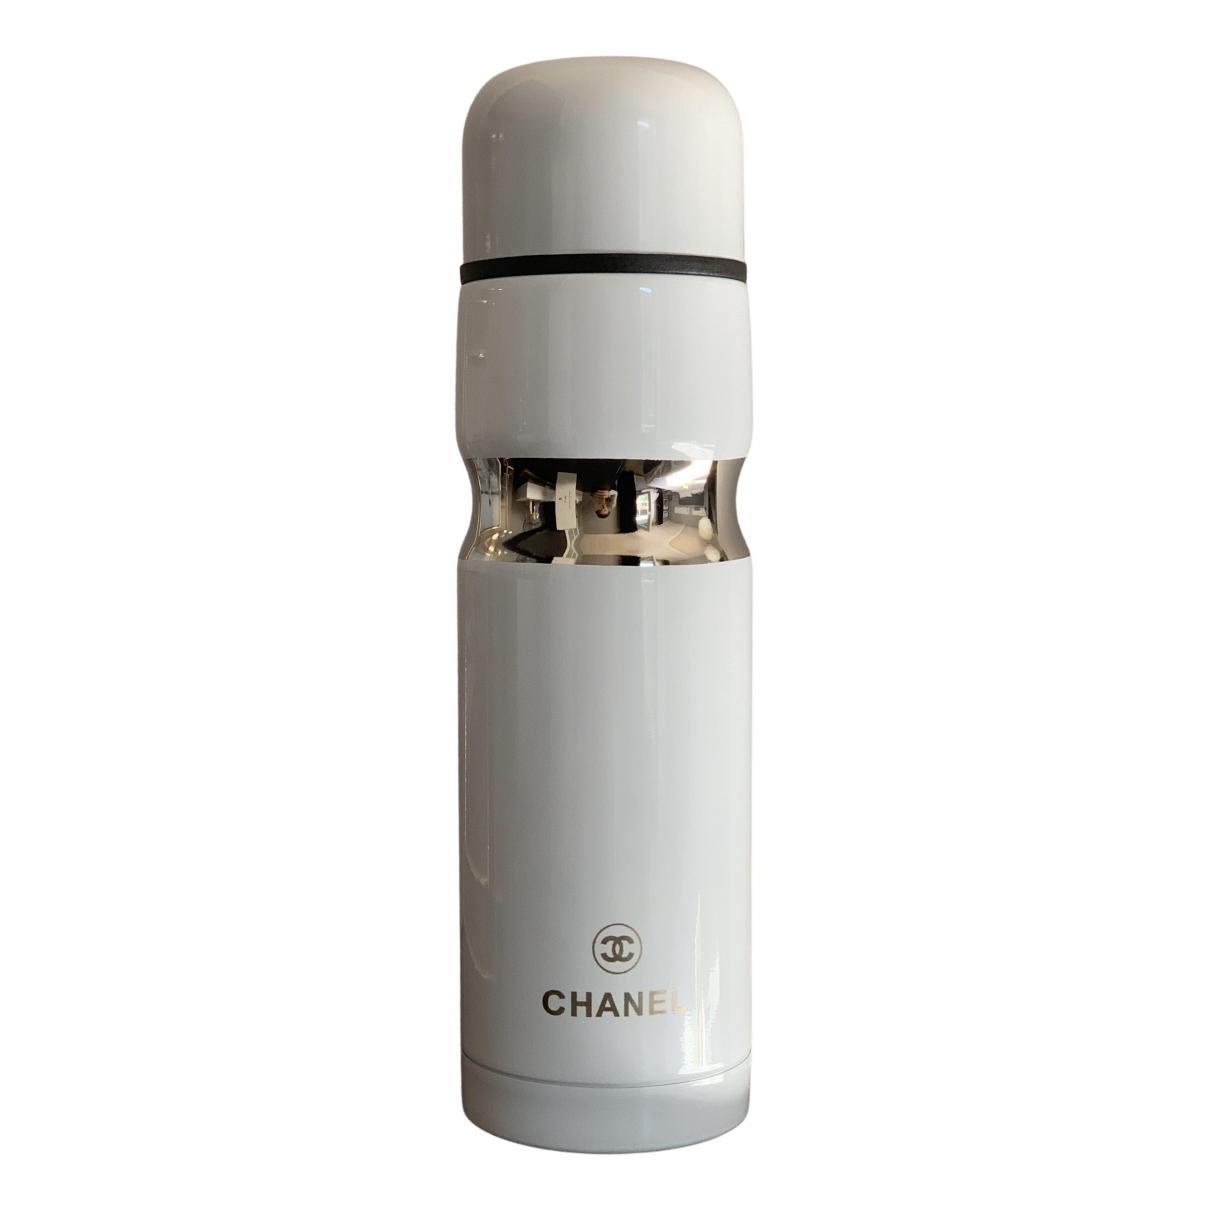 Chanel - Fitness   pour lifestyle en metal - blanc